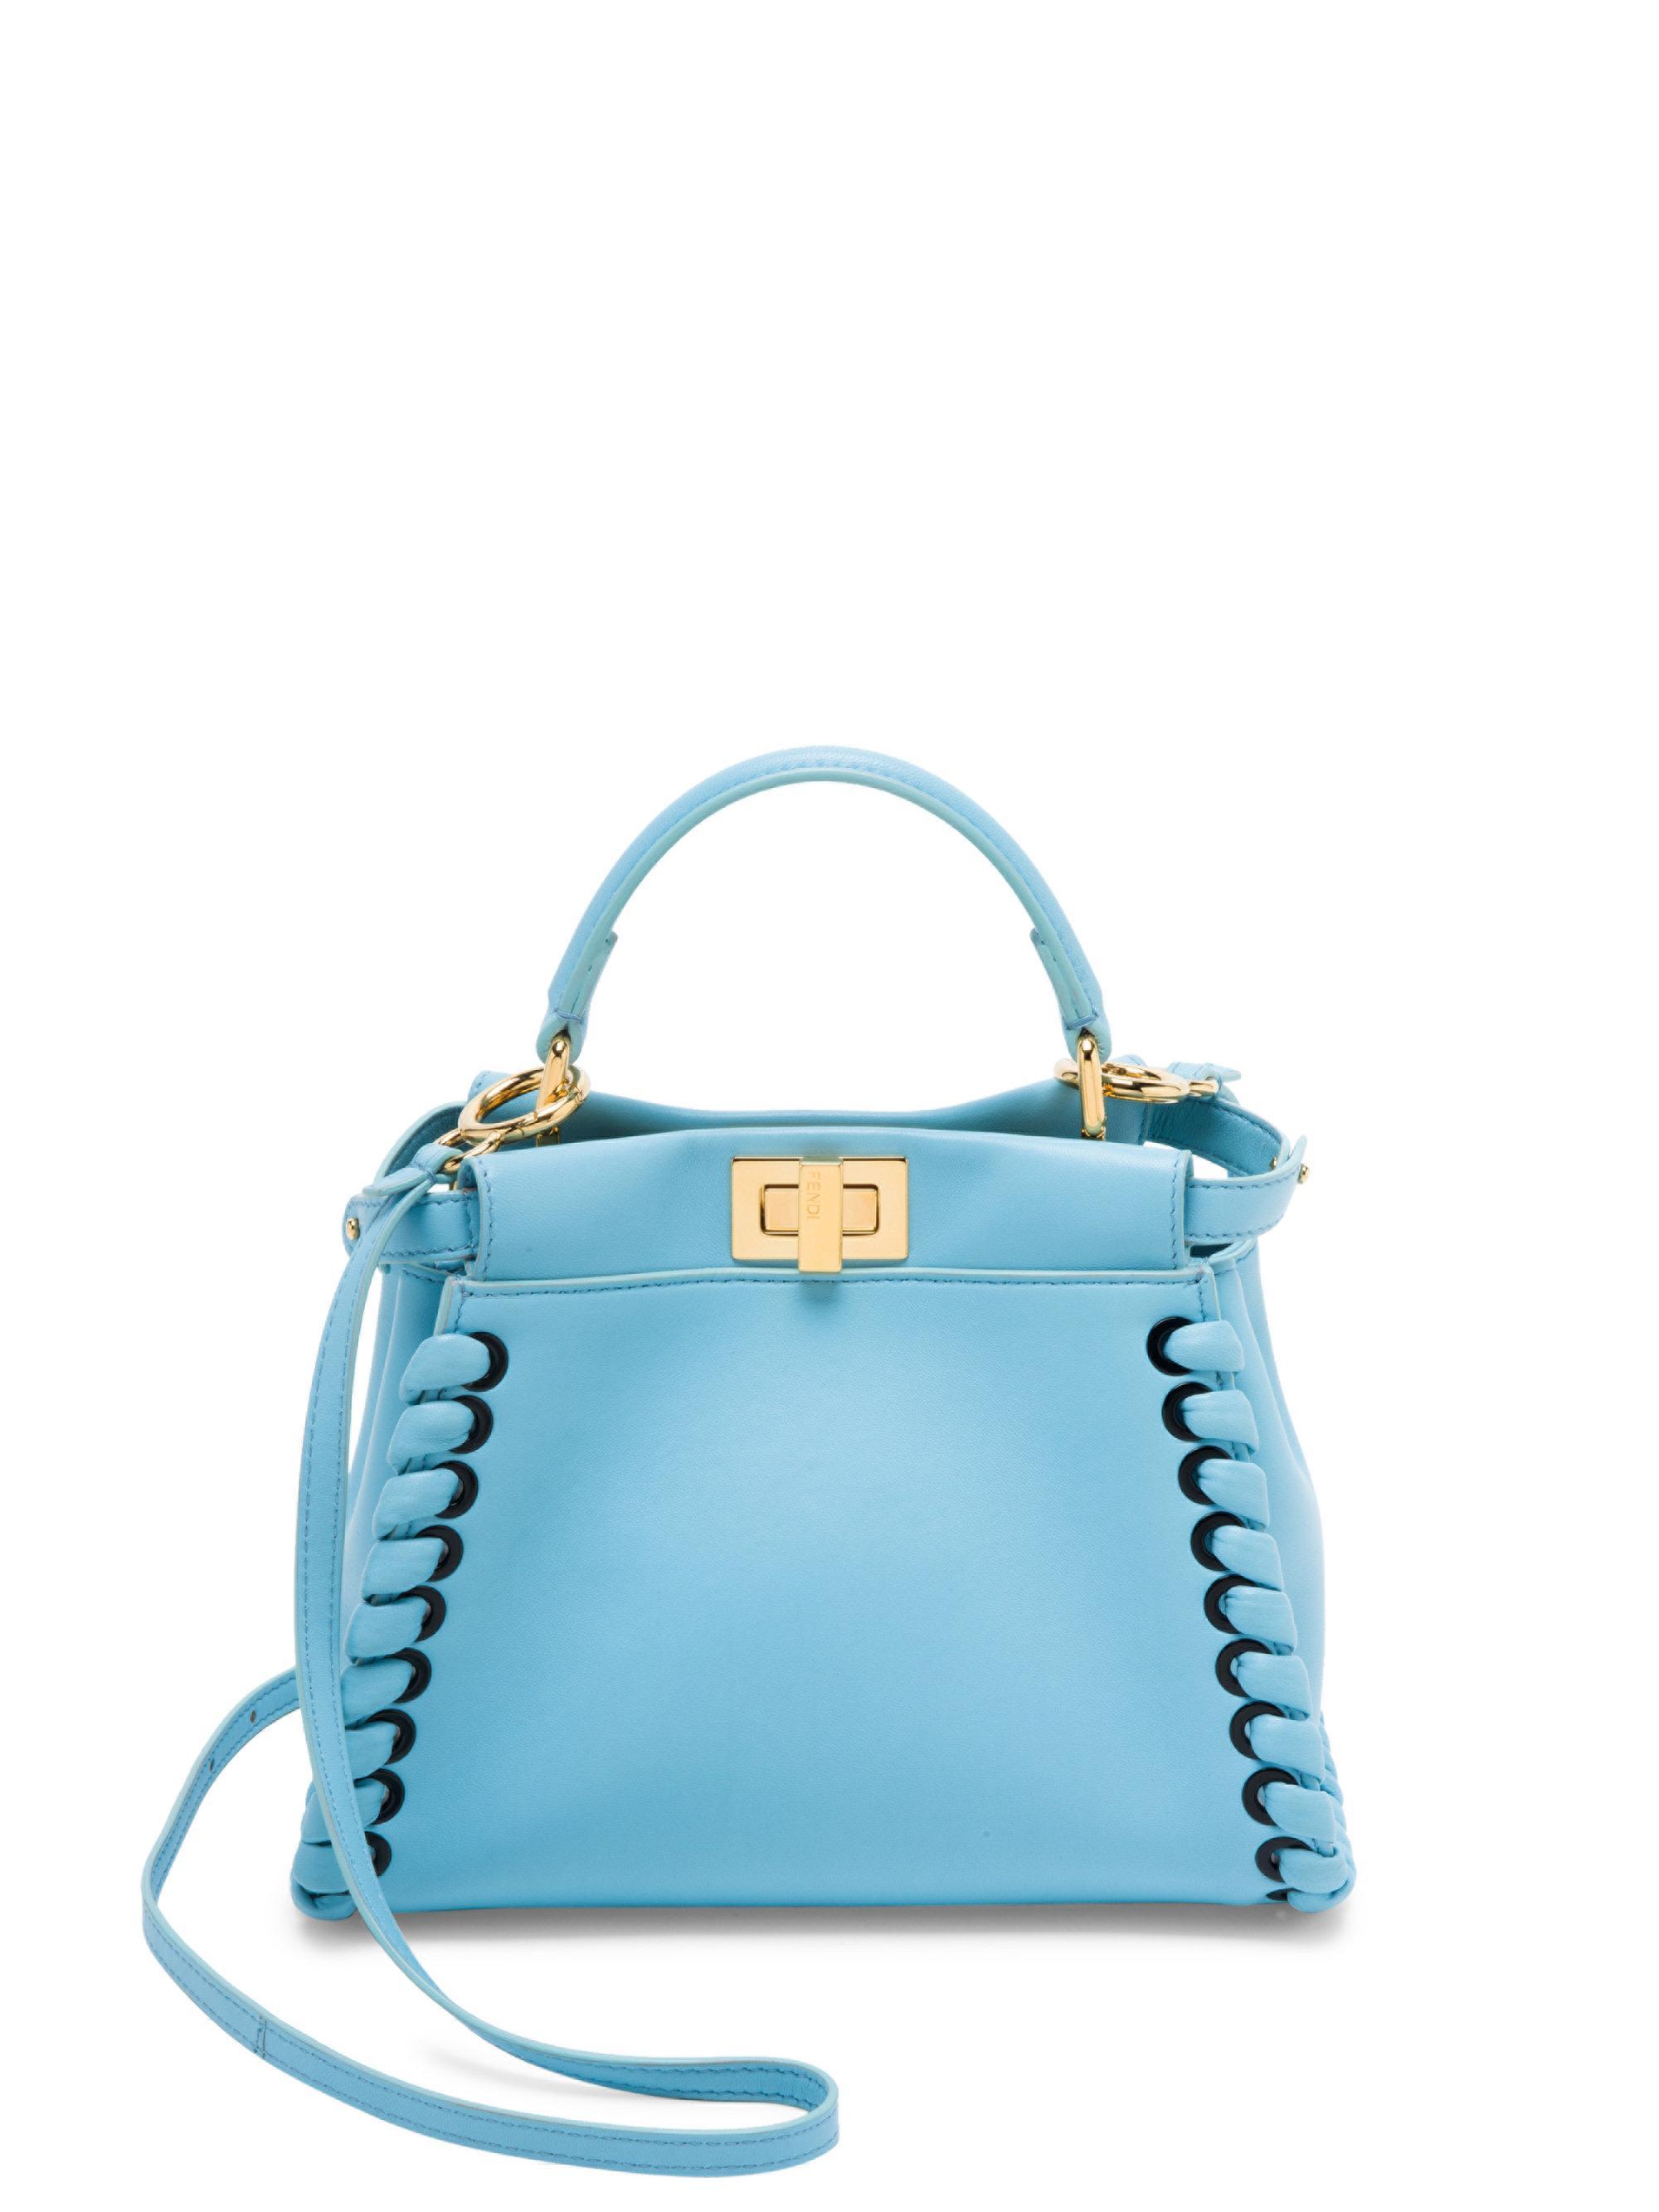 ec1ba413f2 Lyst - Fendi Mini Peekaboo Whipstitch Leather Satchel in Blue